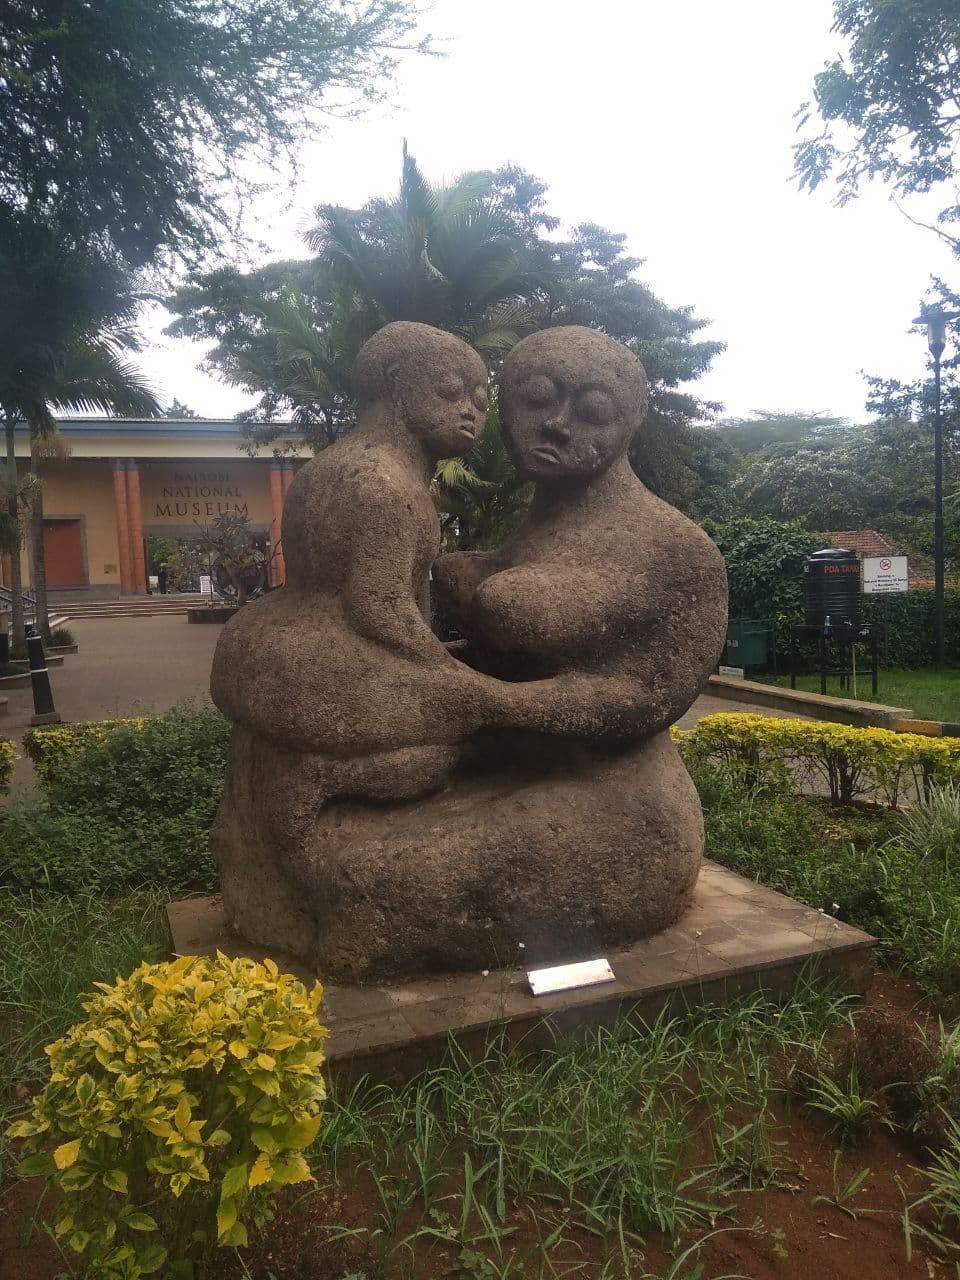 7Q7RU Nairobi, Kenya National Musem 9 November 2020 Image 34